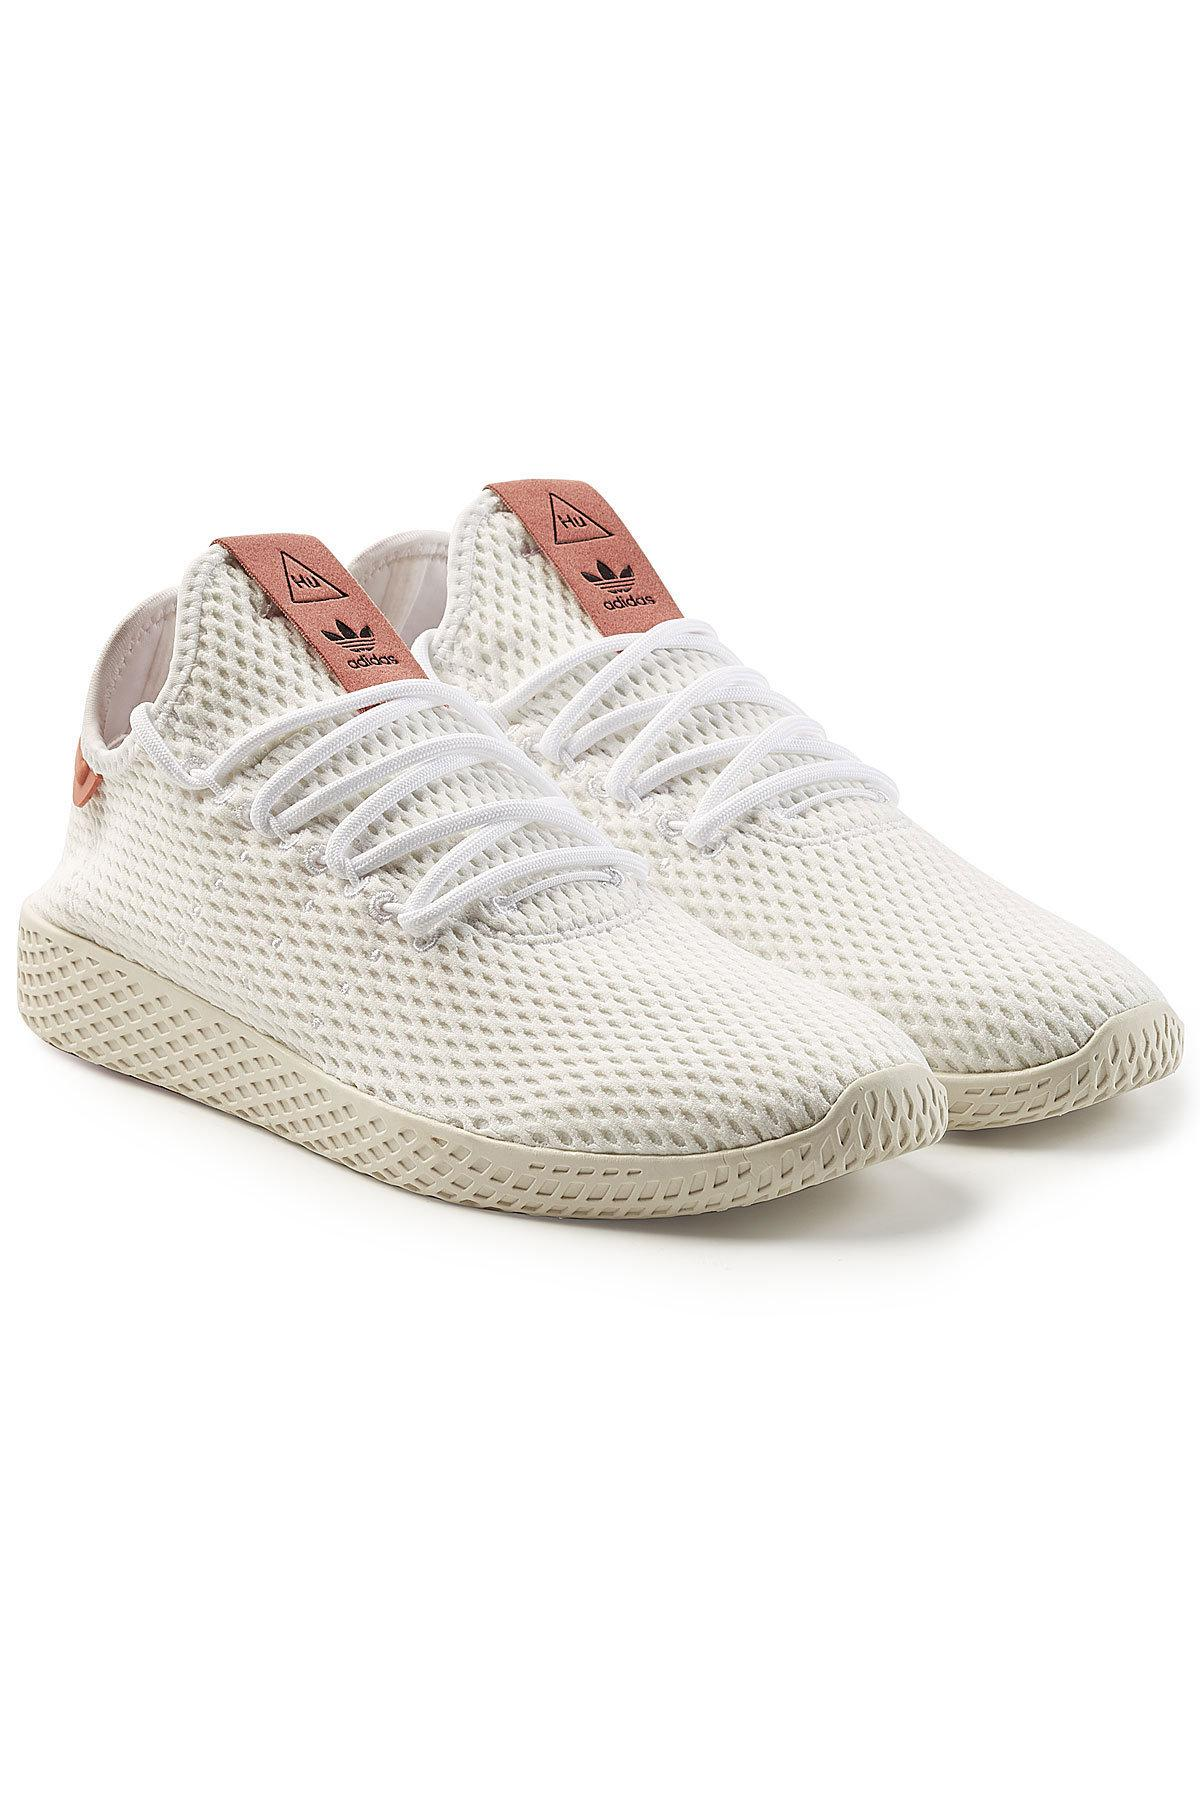 5653dbf2e6617 Lyst - adidas Originals Pharrell Williams Tennis Hu Sneakers for Men